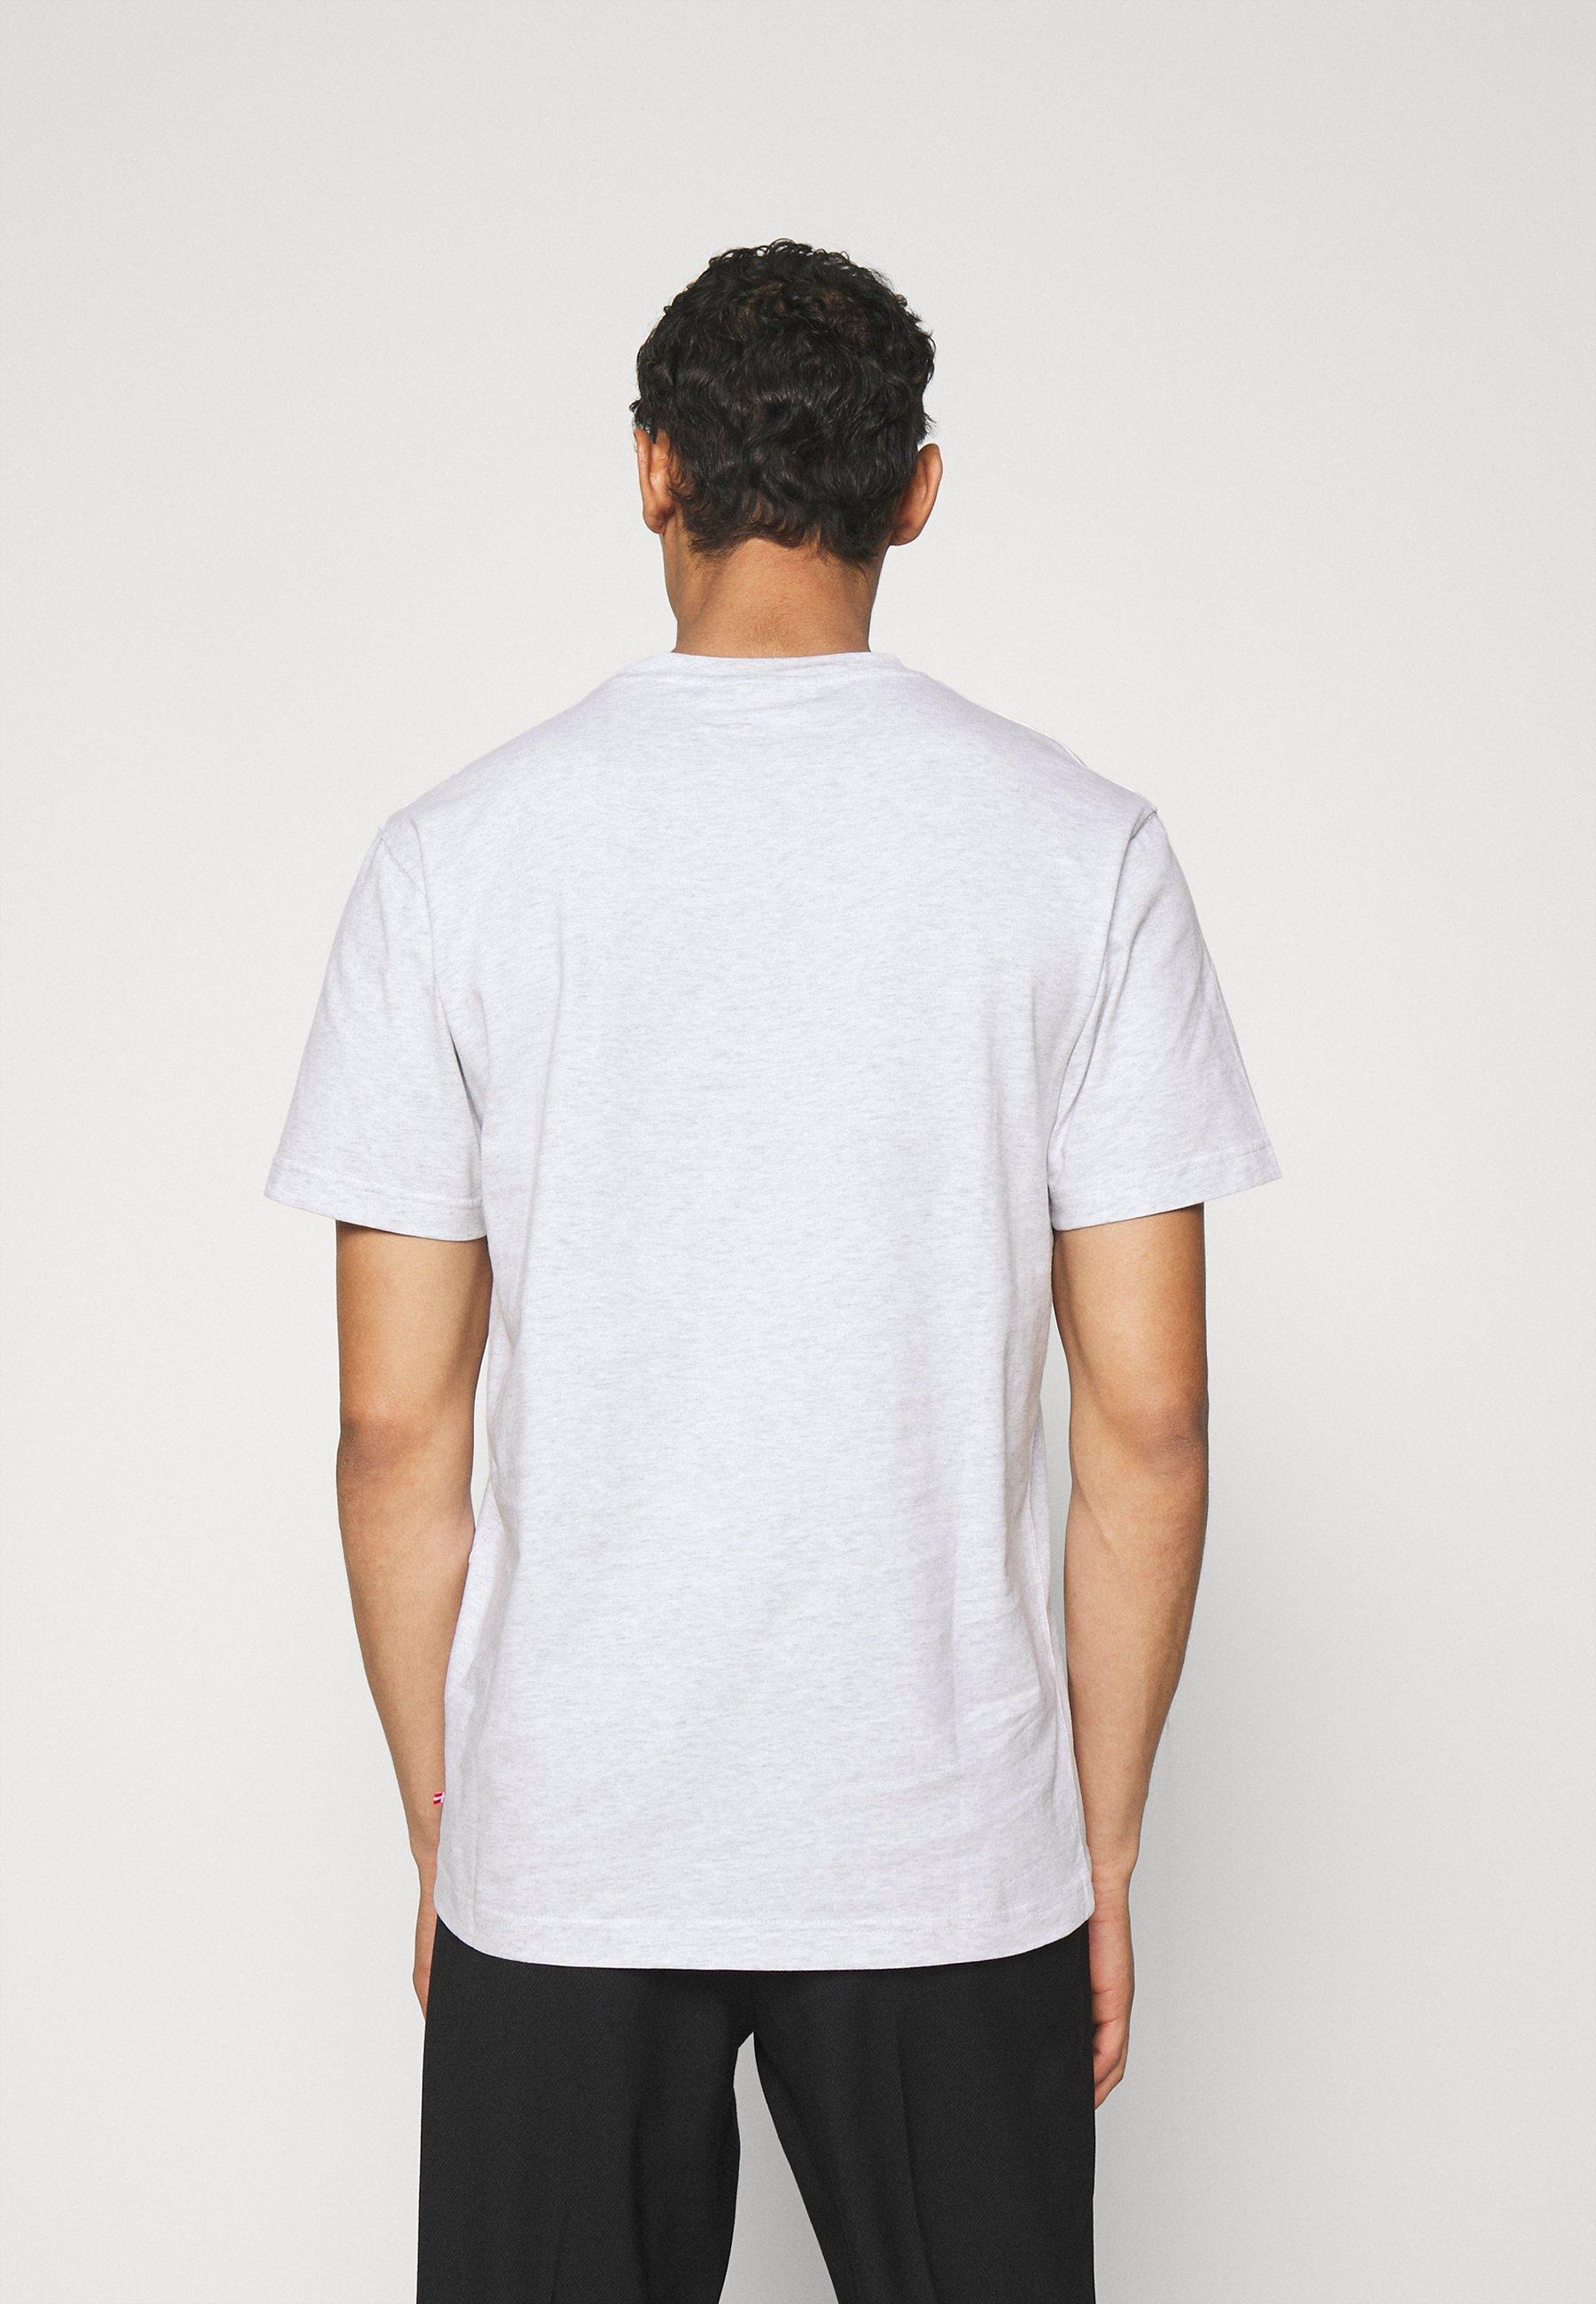 Men CASUAL TEE SHORT SLEEVE - Basic T-shirt - light grey melange